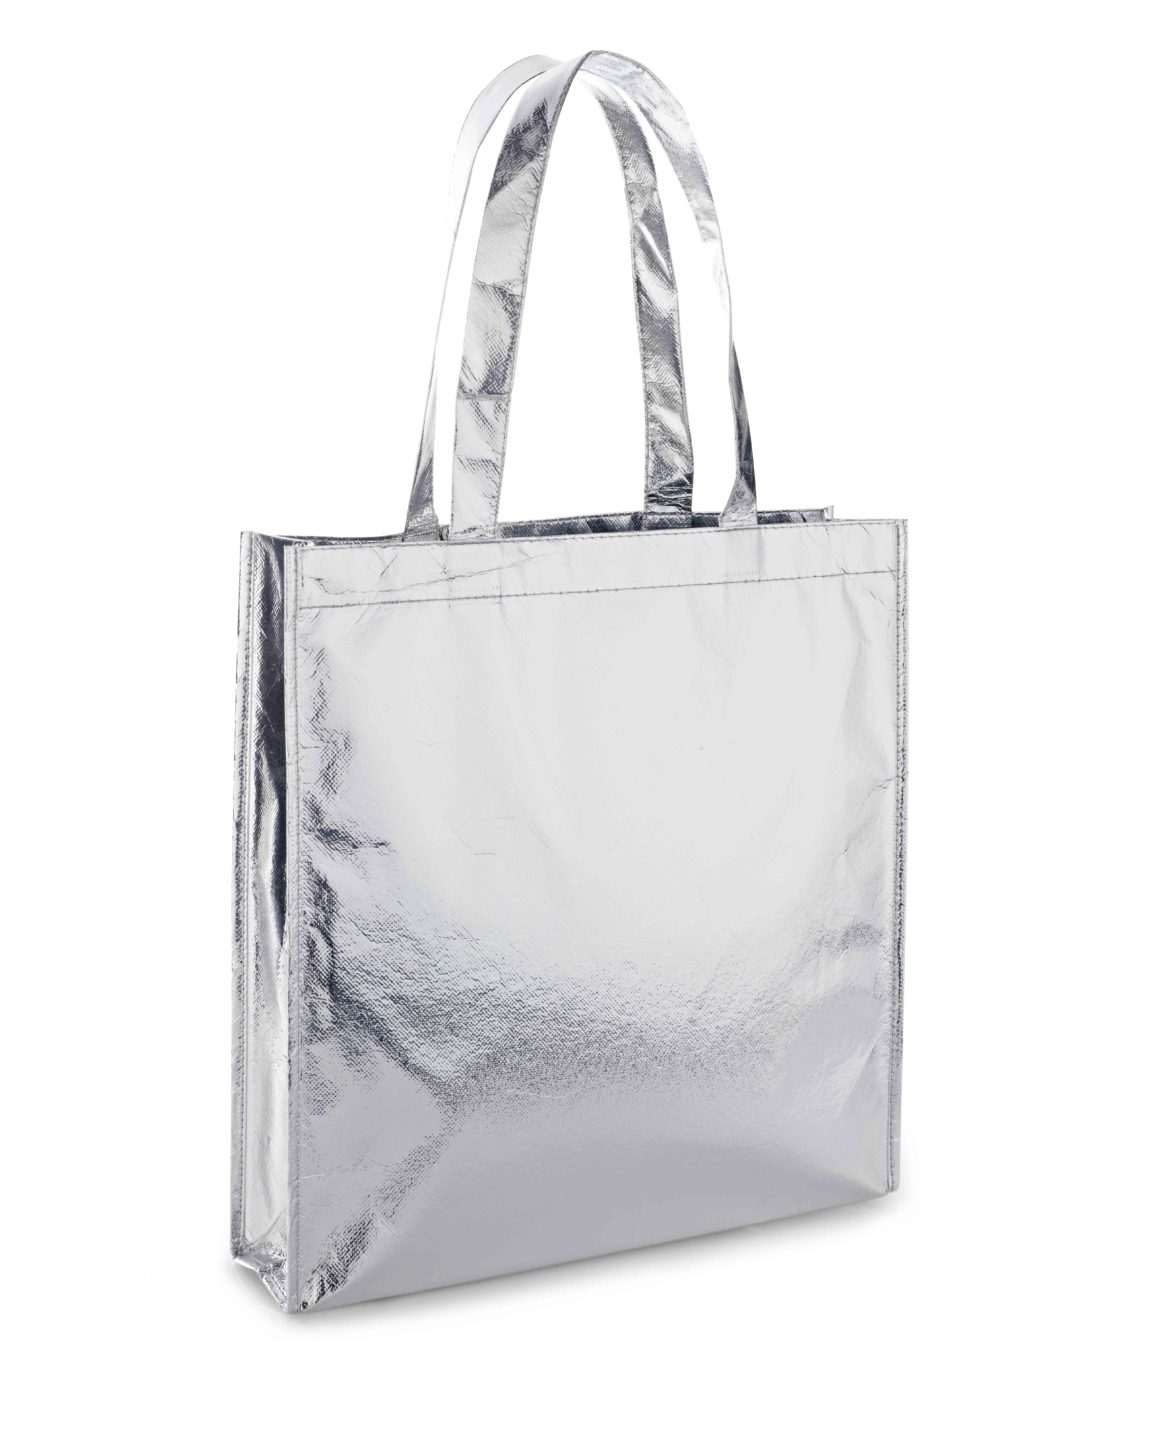 Fowey Shiny Eco Bag Product Code GP92850